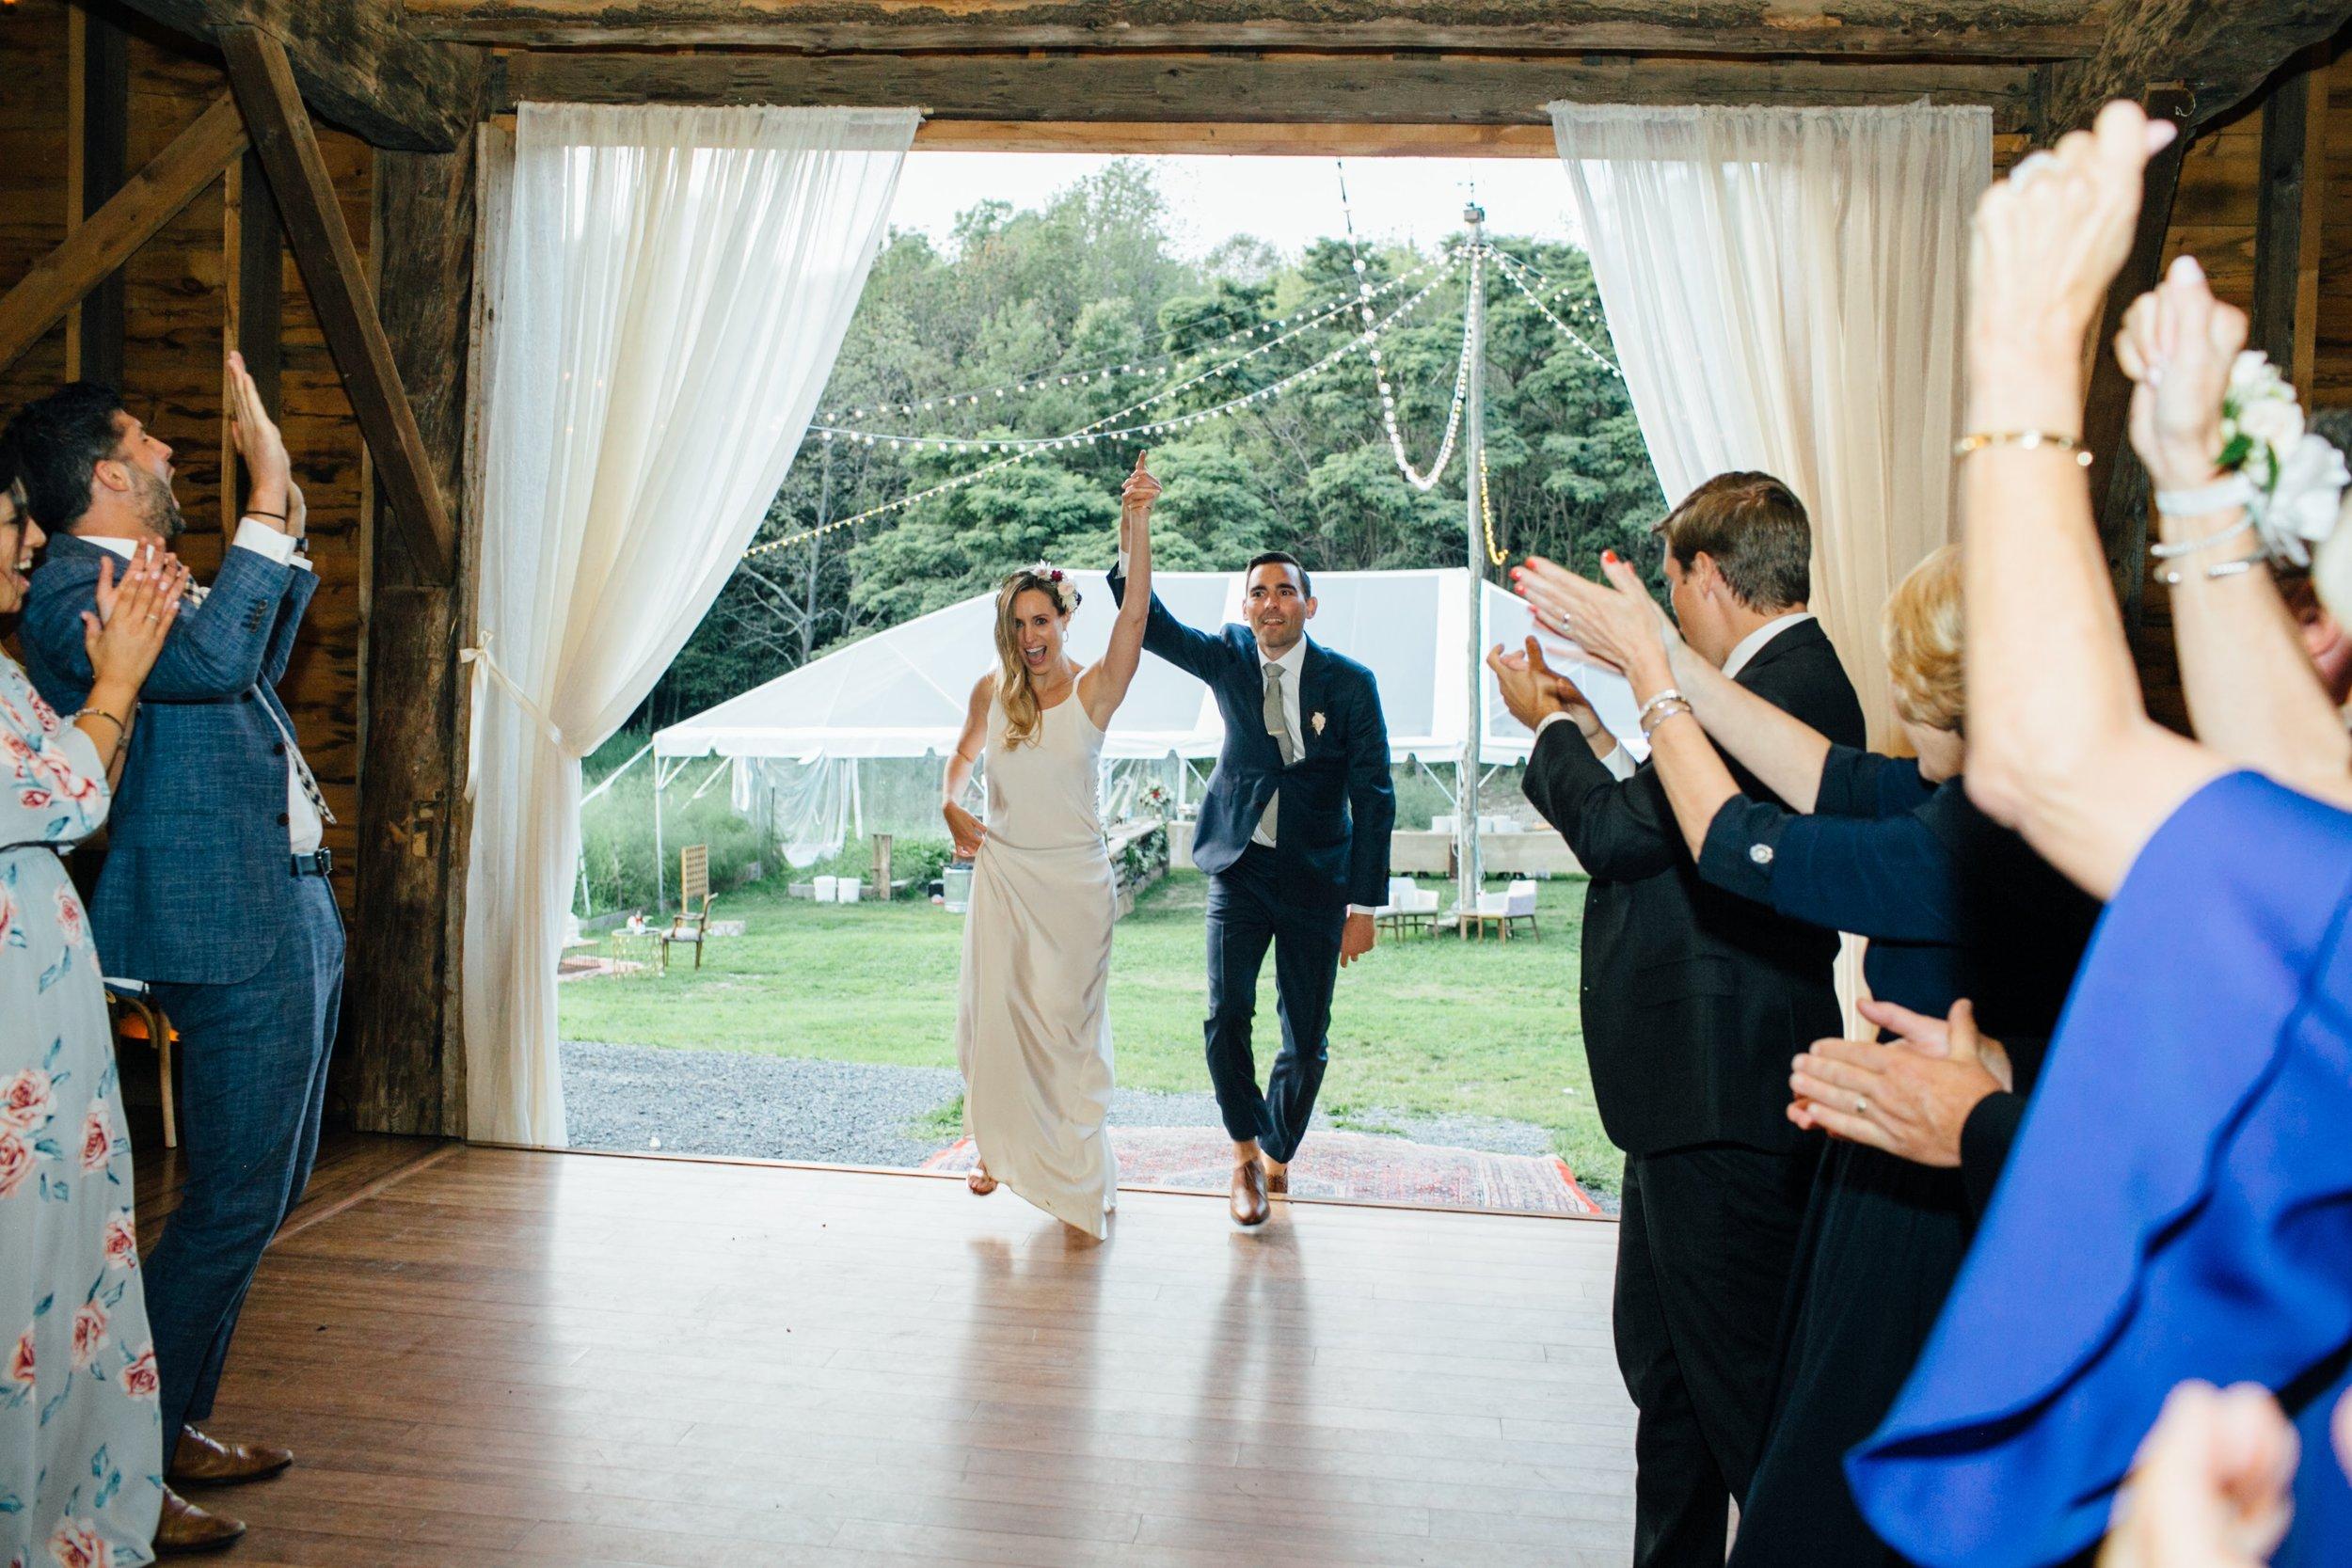 Courtney + Matt Blenheim Hill Farm Catskills NY Wedding Veronica Lola Photography 2017-529.jpg